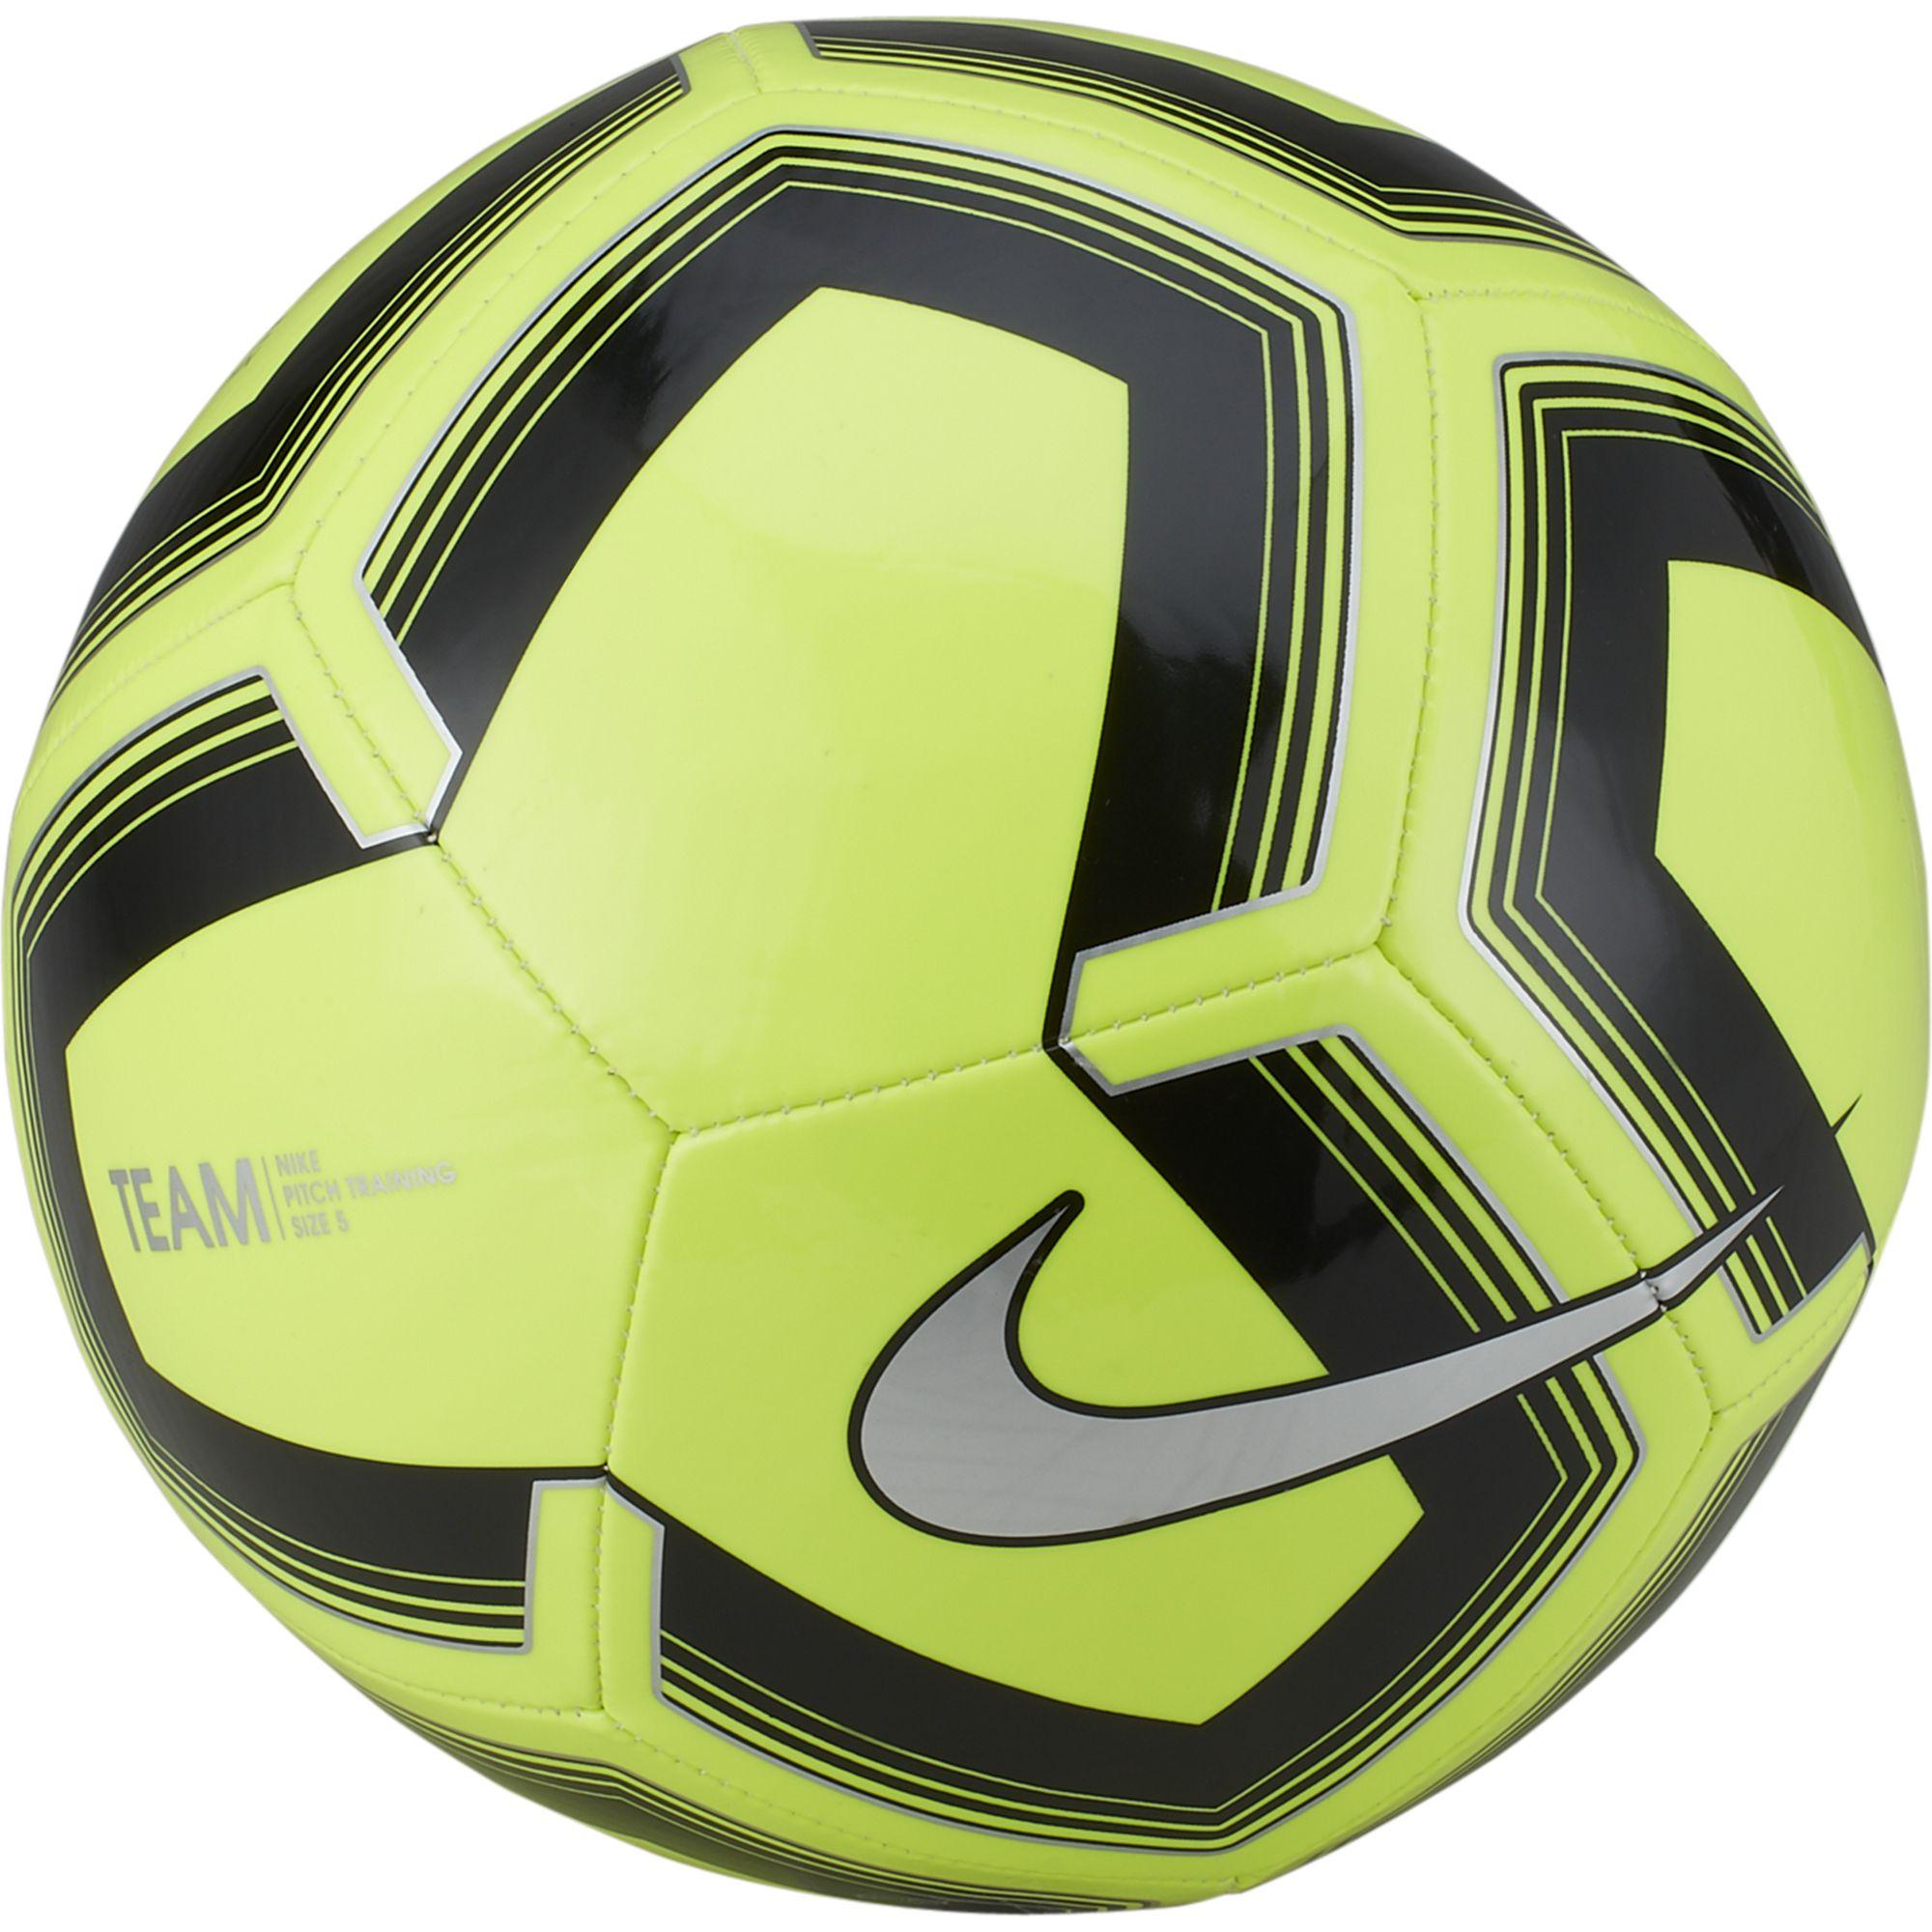 Pitch Training Soccer Ball, Yellow/Black, swatch